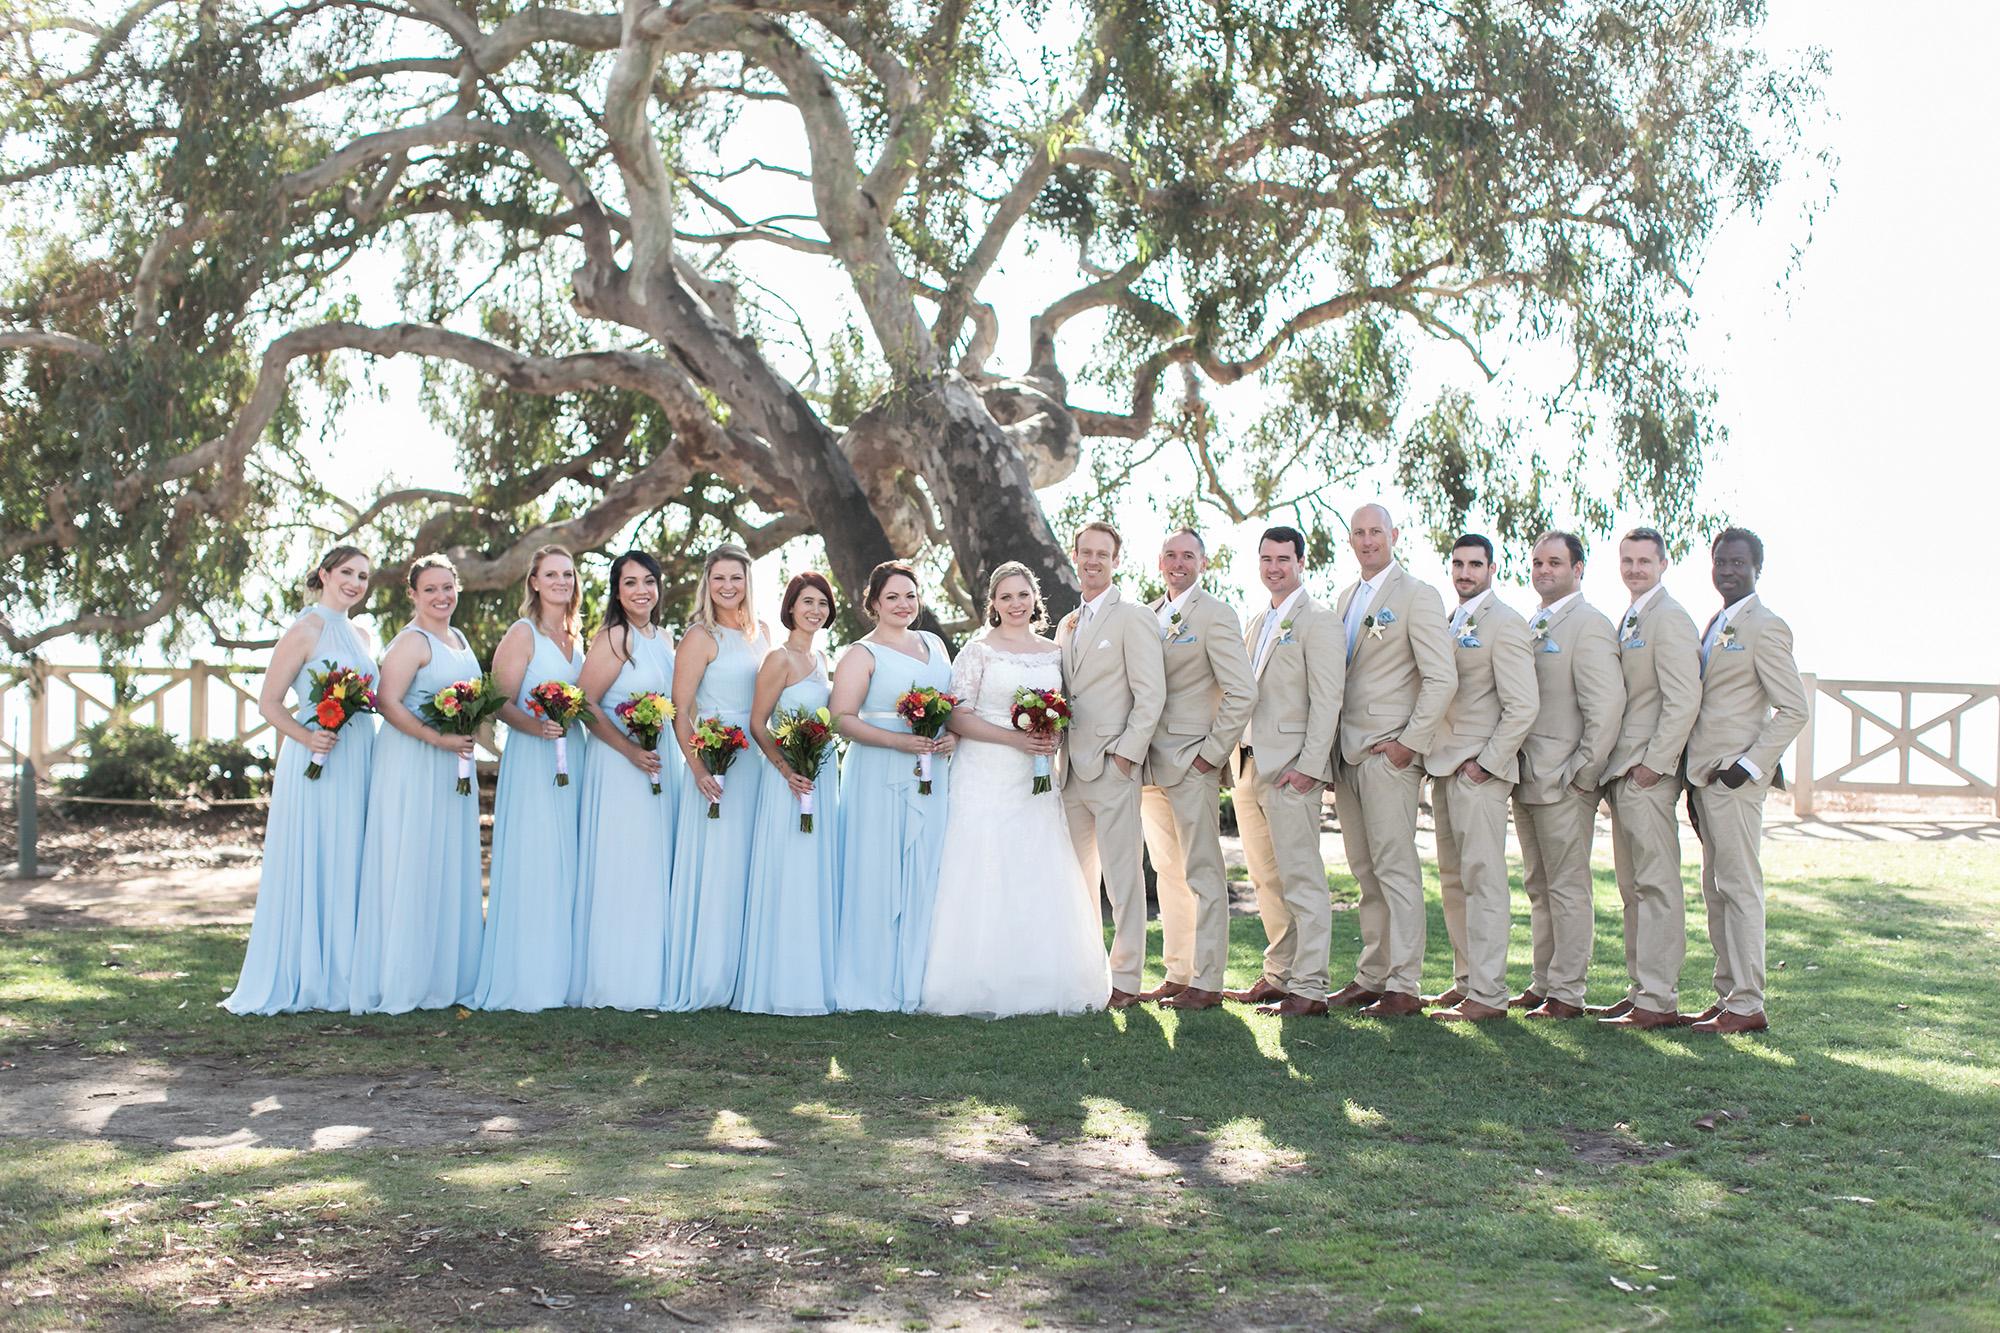 unforgettable-st-monica-wedding-carrie-vines-photography-048.jpg